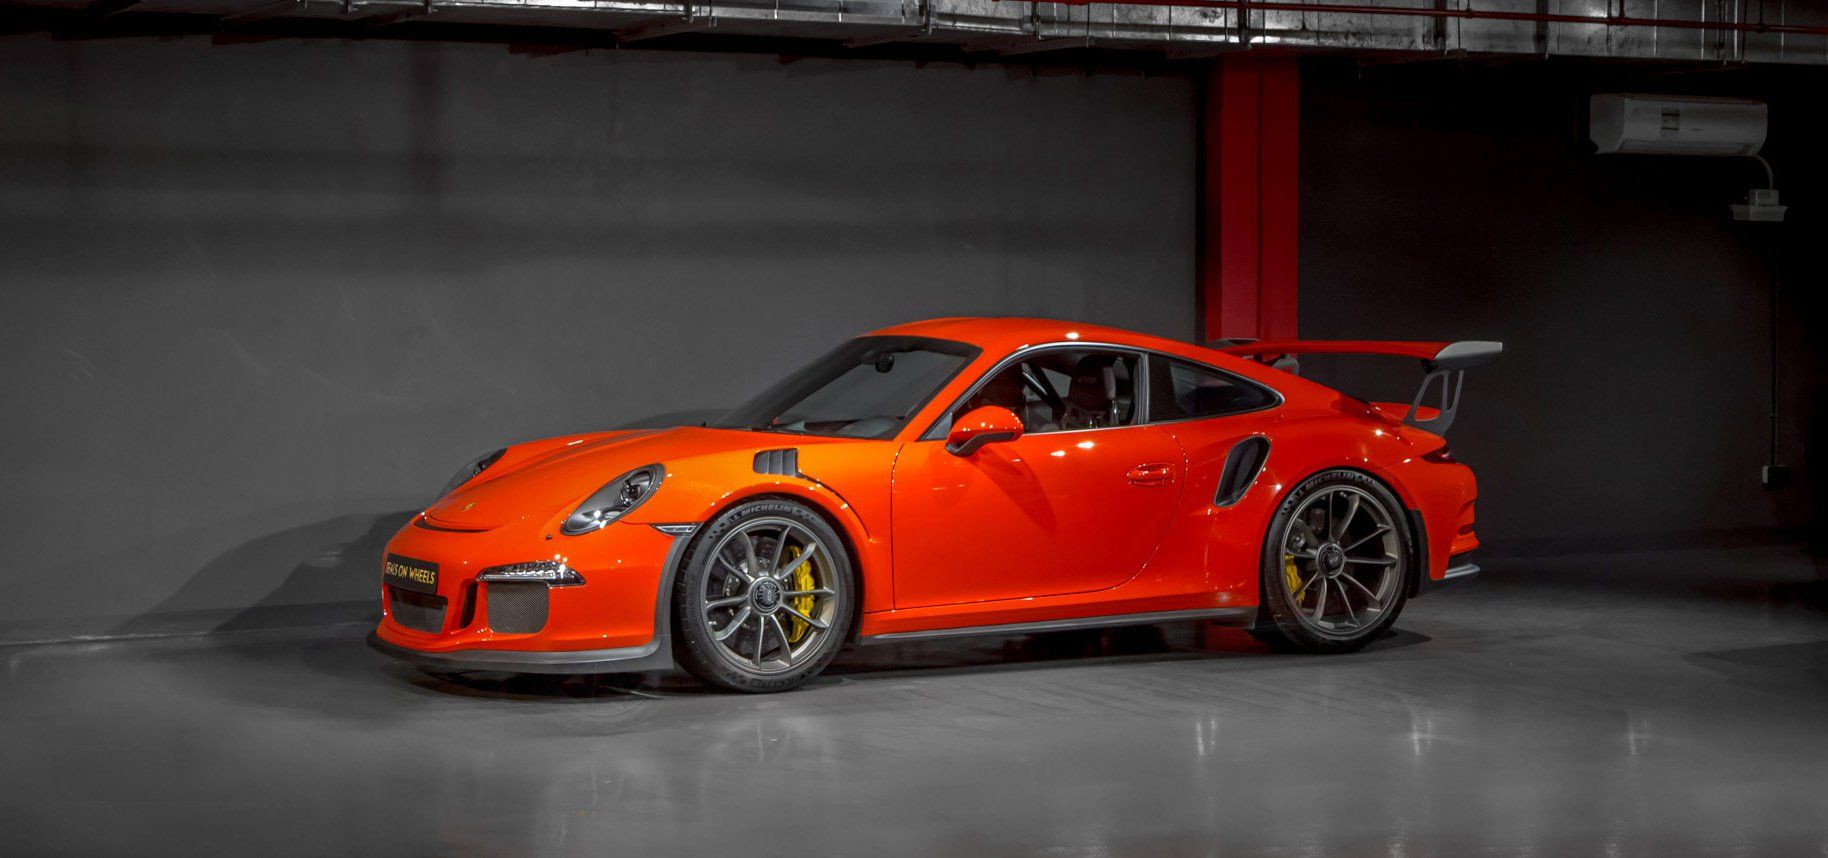 Now Available At Deals On Wheels Main Showroom Branch Beside Oasis Centre Exit 46 Sheikh Zayed Road Dubai Uae Tel 043387 Porsche 911 Gt3 Gt3 Rs Porsche 911